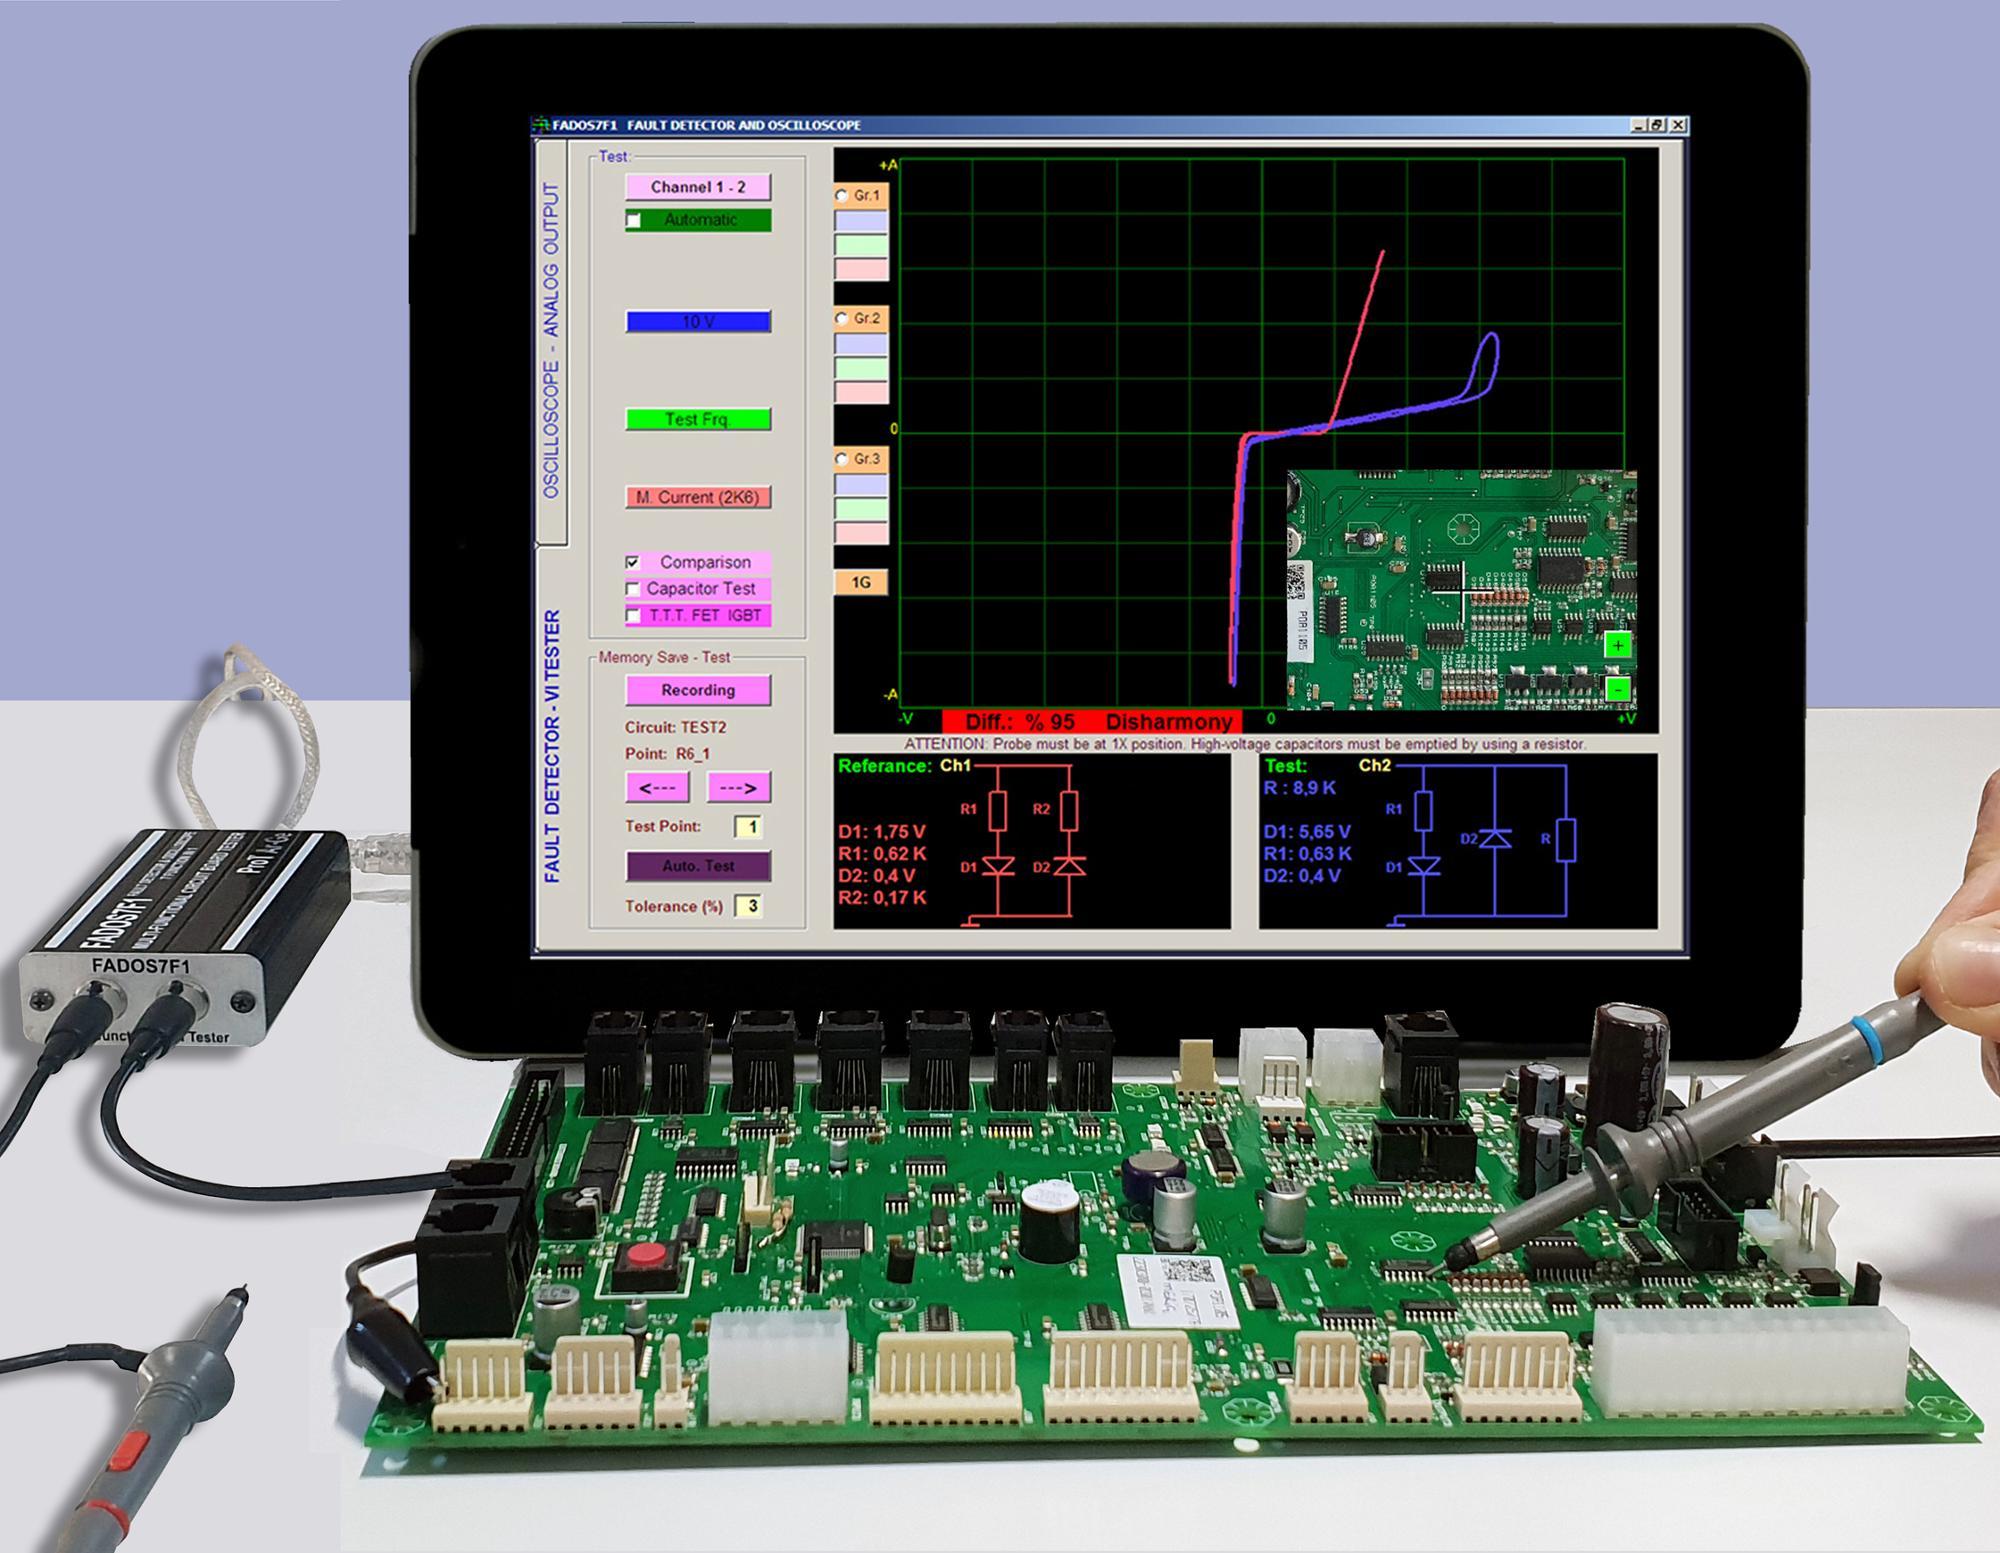 Fados7f1 كاشف الأخطاء أداة تشخيص السادس اختبار لجميع أنواع لوحات الدوائر الإلكترونية وحدة نقدية أوروبية لوحات Buy Huntron Polar Polart3000 Polart6000 Qmax Vi Tester Qmax